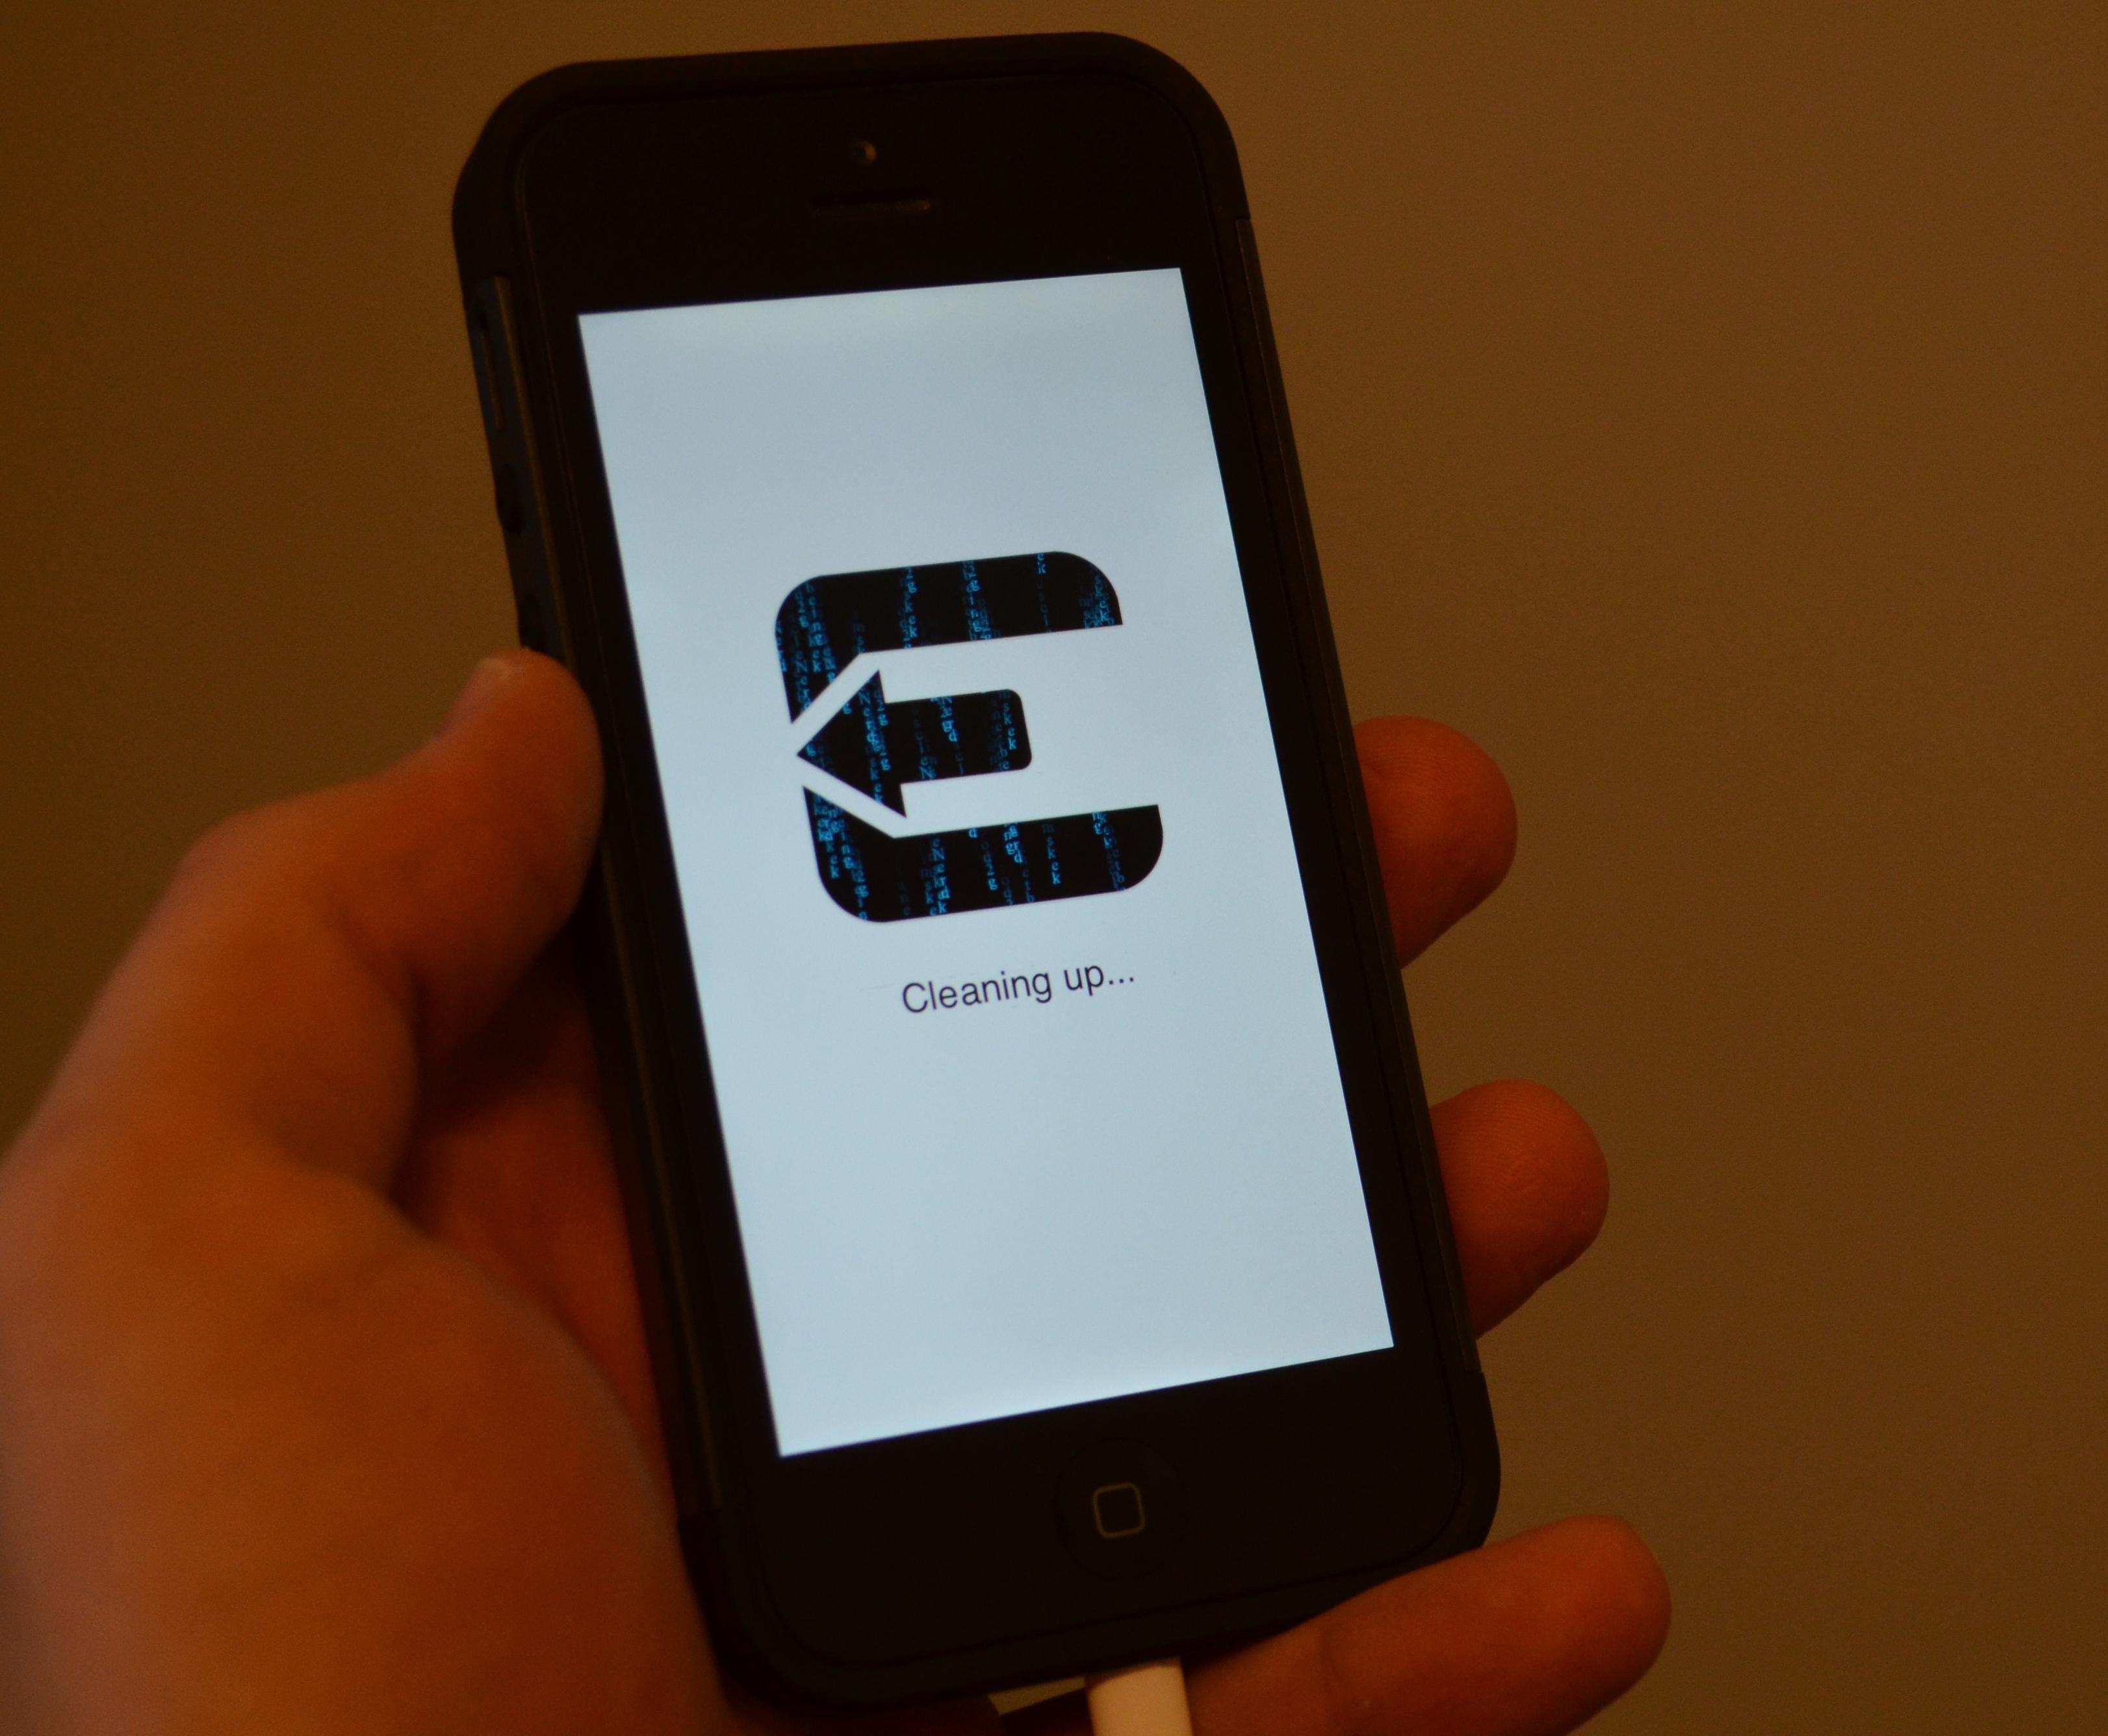 How to Jailbreak Your iOS 5 Device